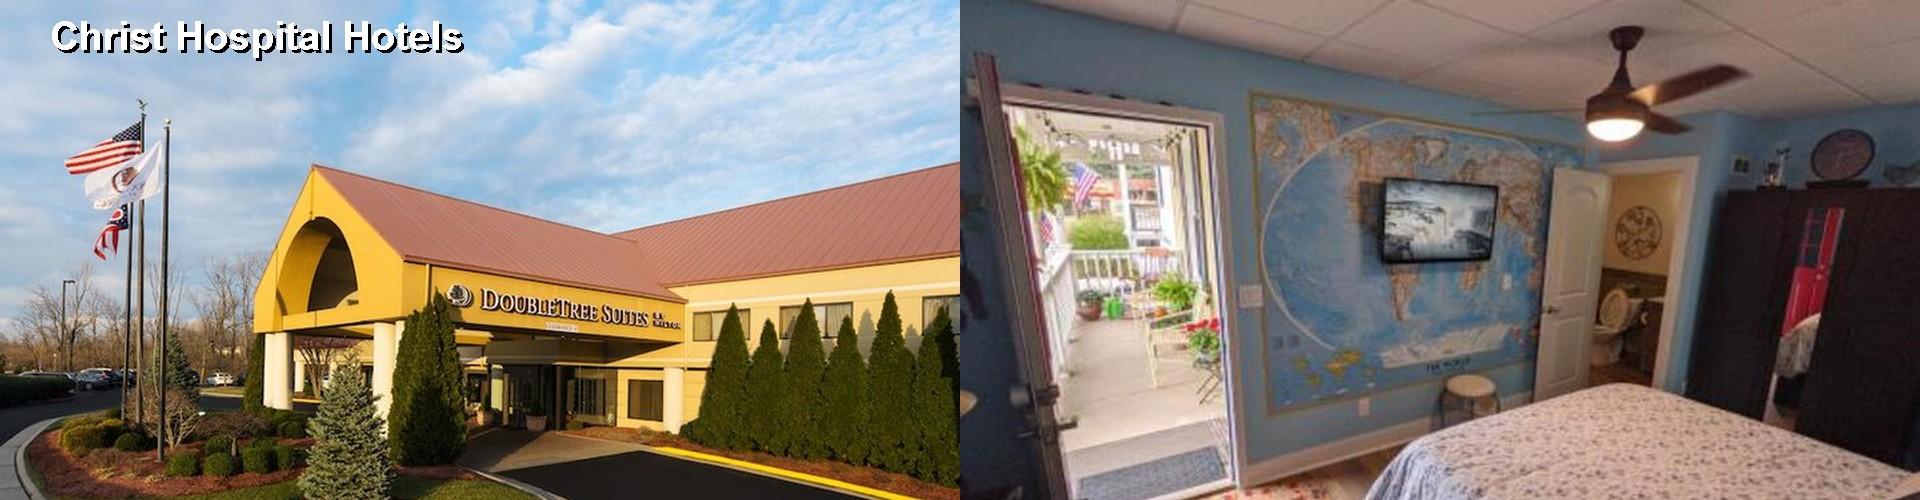 5 Best Hotels Near Christ Hospital